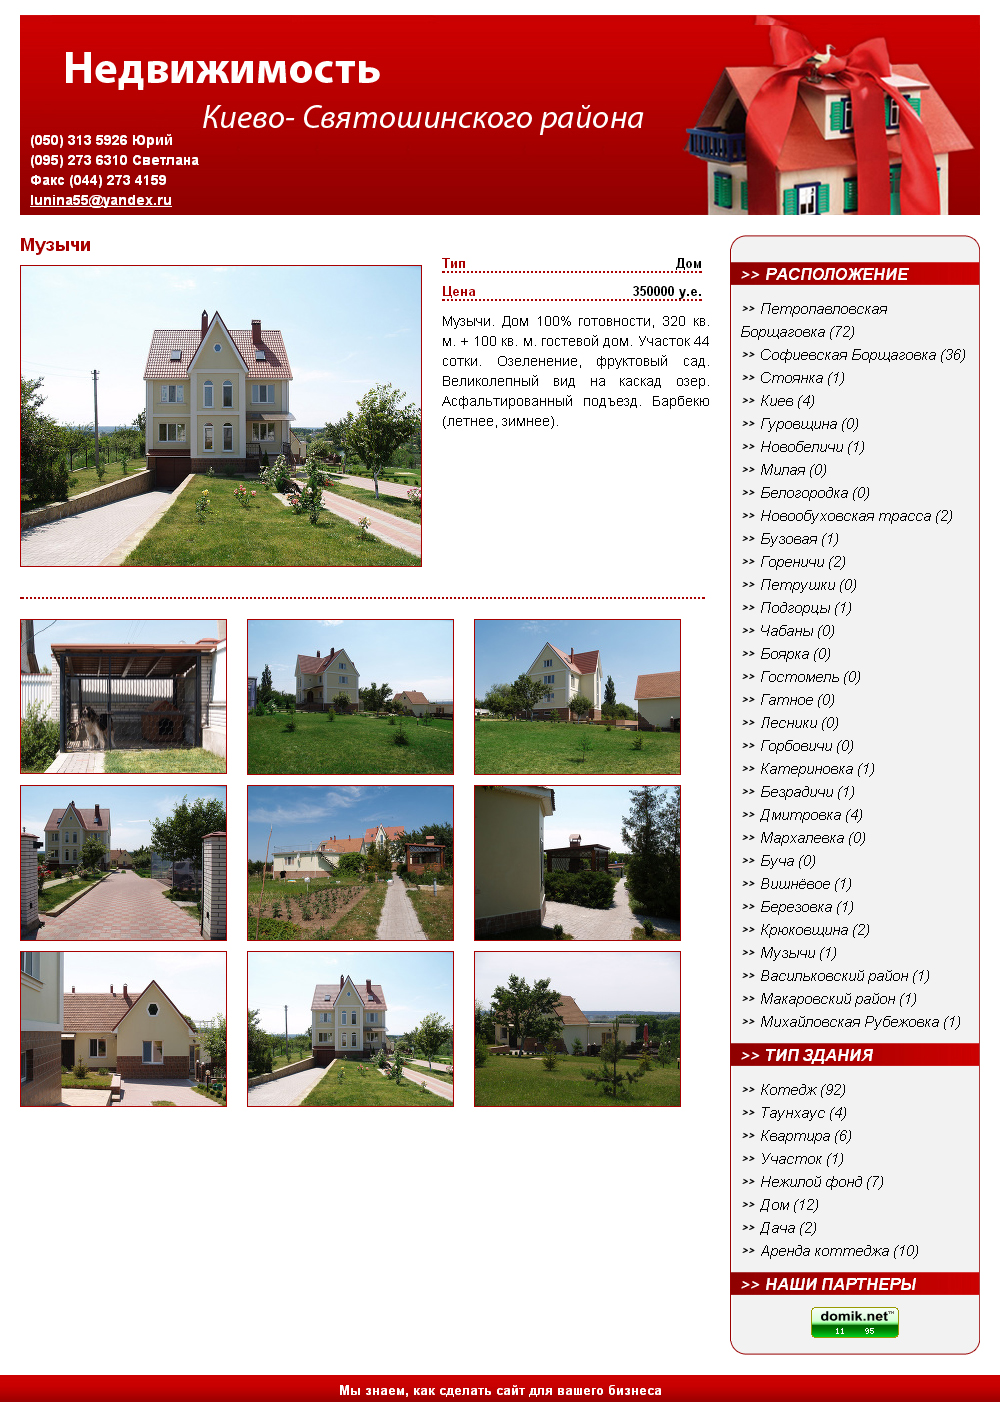 Сайты с частными фотографиями 4 фотография